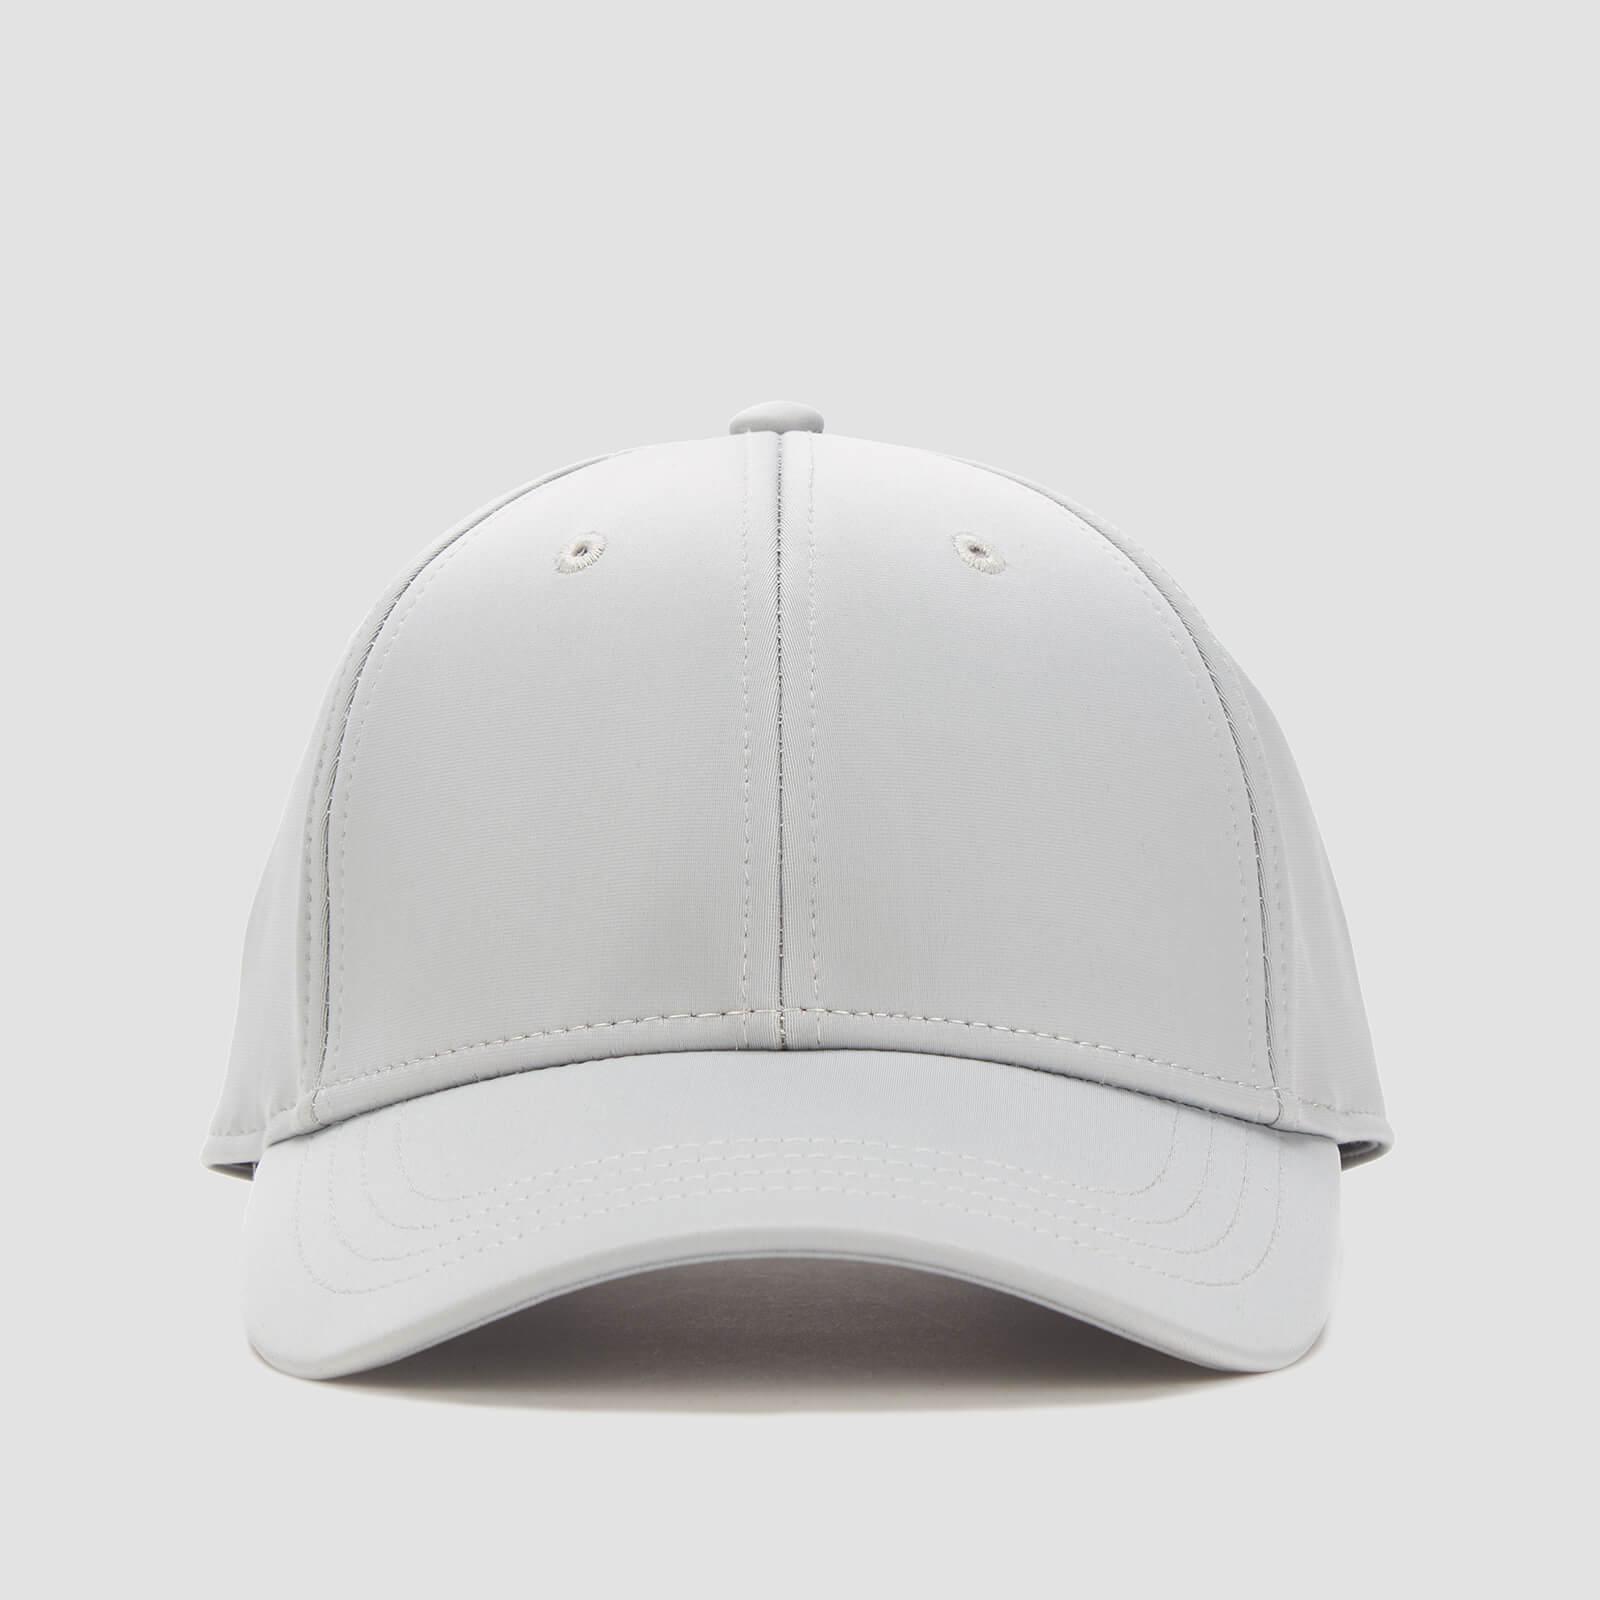 Myprotein MP Women's Baseball Cap - Sulphur Grey